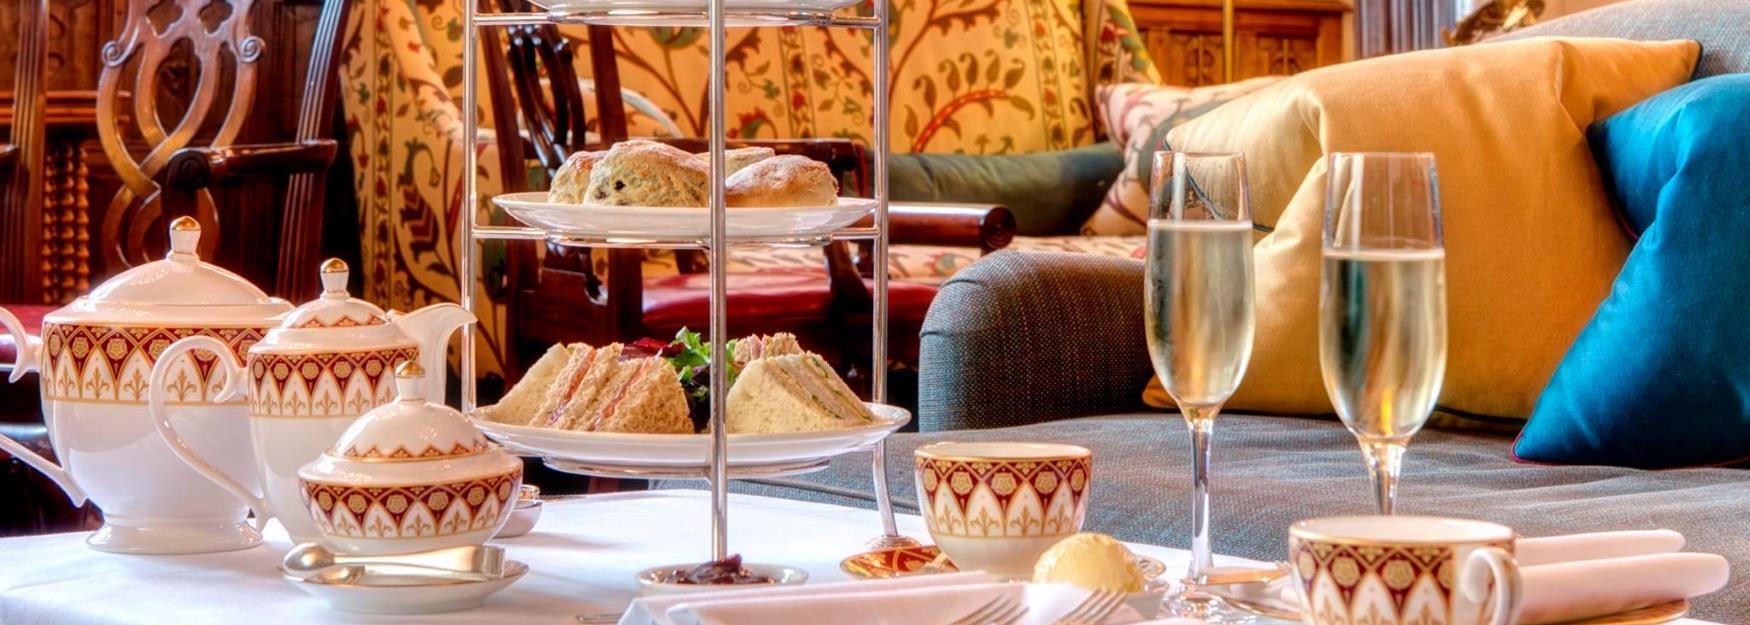 Traditional afternoon tea served at Ellenborough Park Hotel, Cheltenham